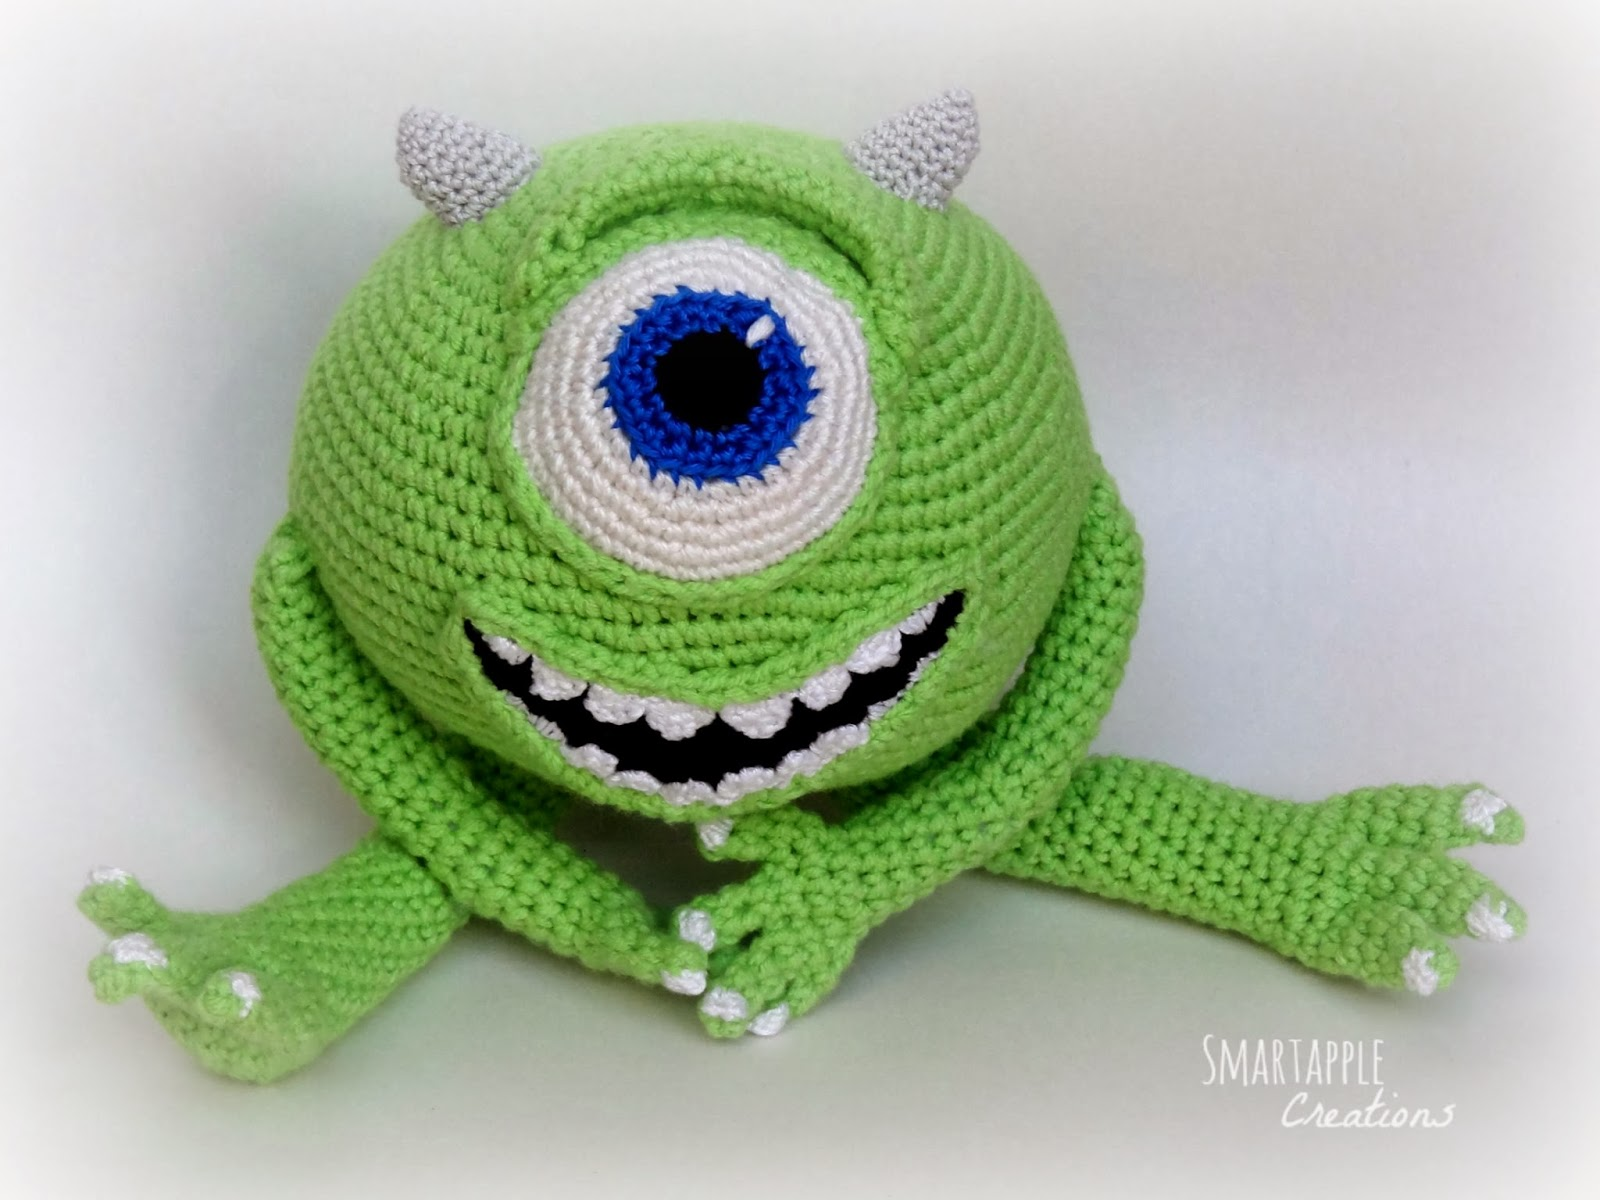 Amigurumi Monsters : Smartapple Creations - amigurumi and crochet: Amigurumi ...